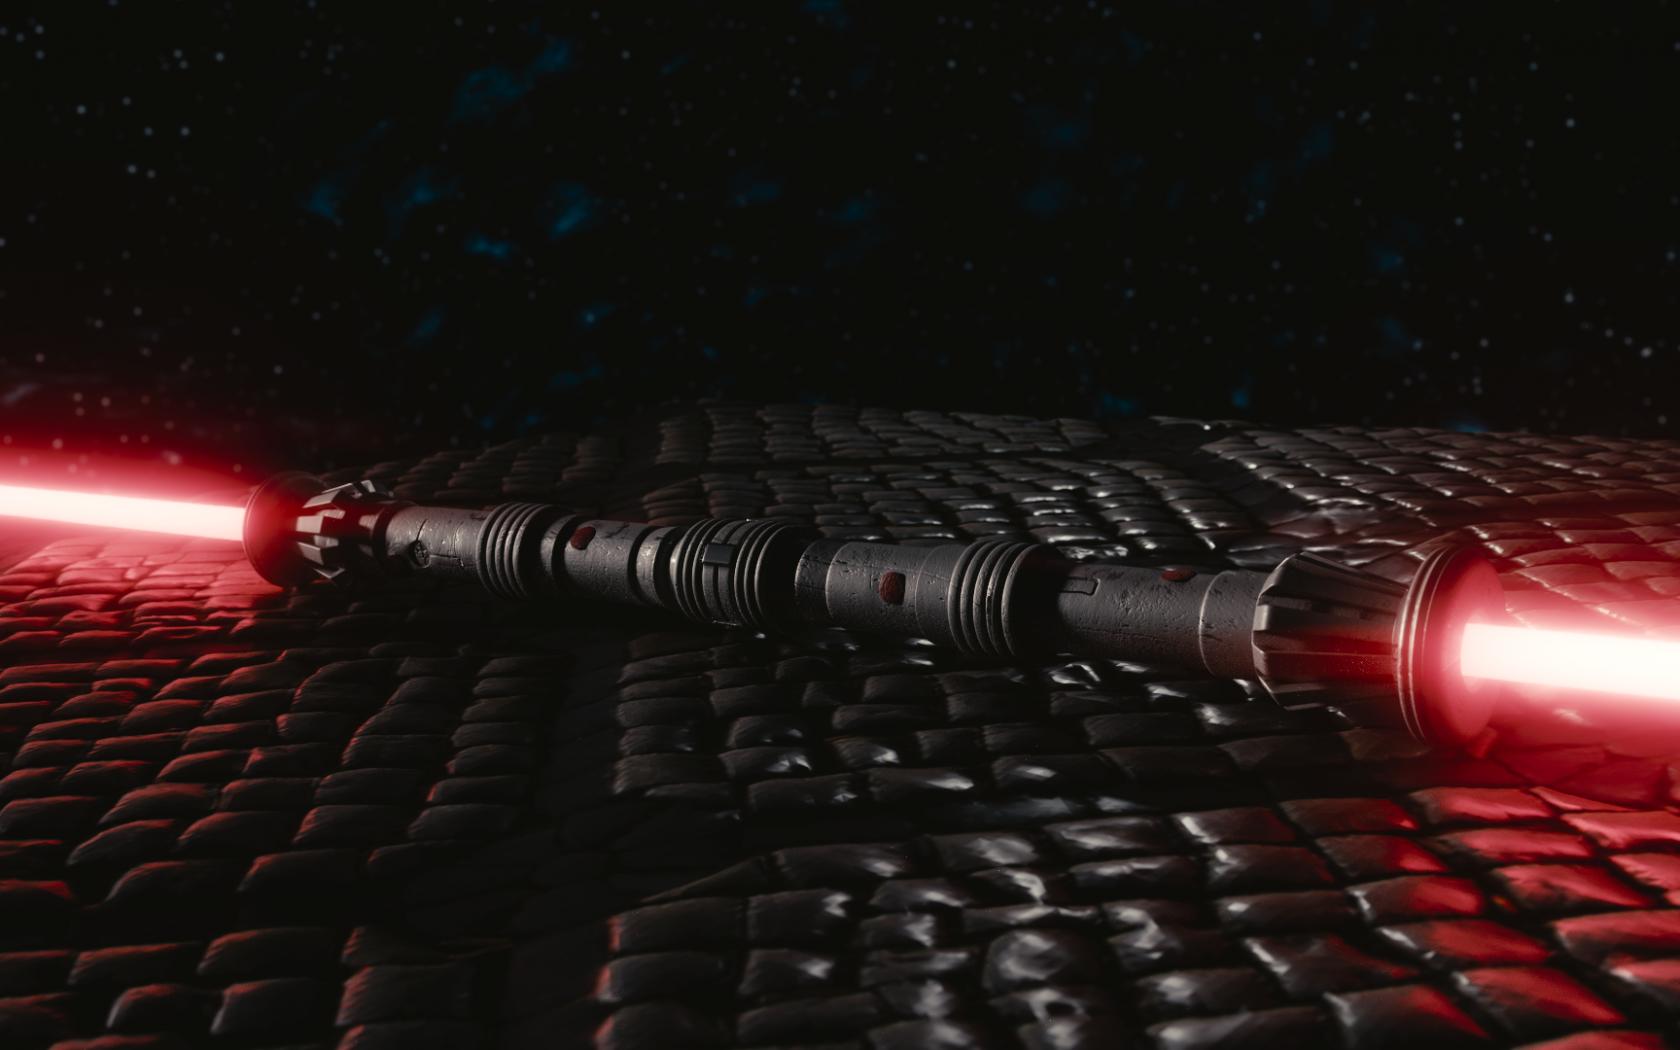 Star Wars Darth Maul Lightsaber Hd Wallpaper